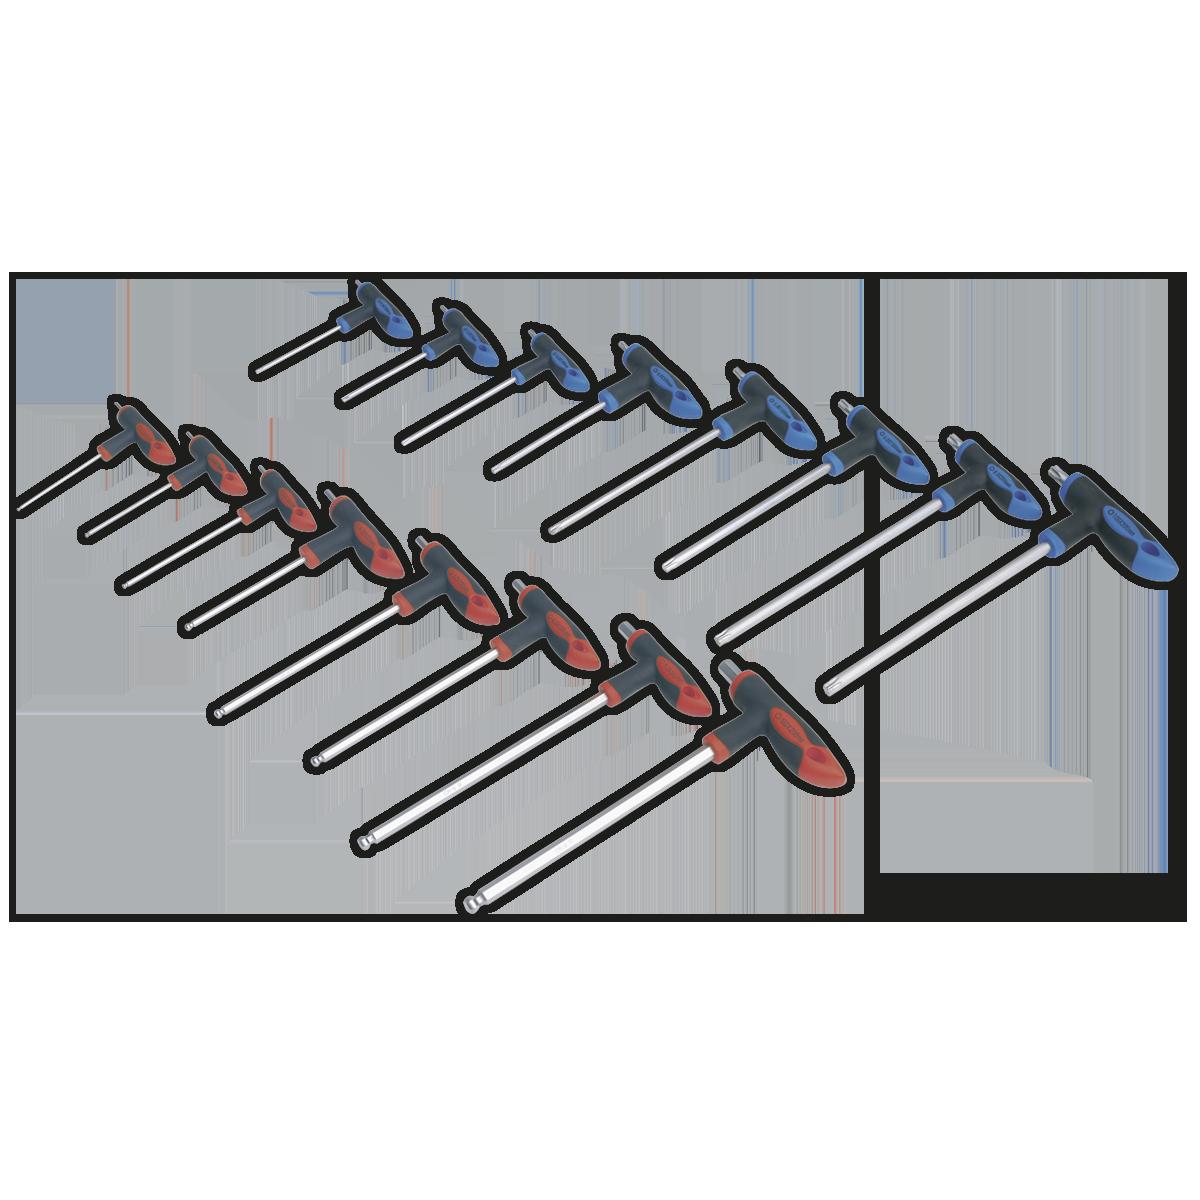 S0466 Siegen Hex Key Set 10pc T-Handle Metric Key Sets